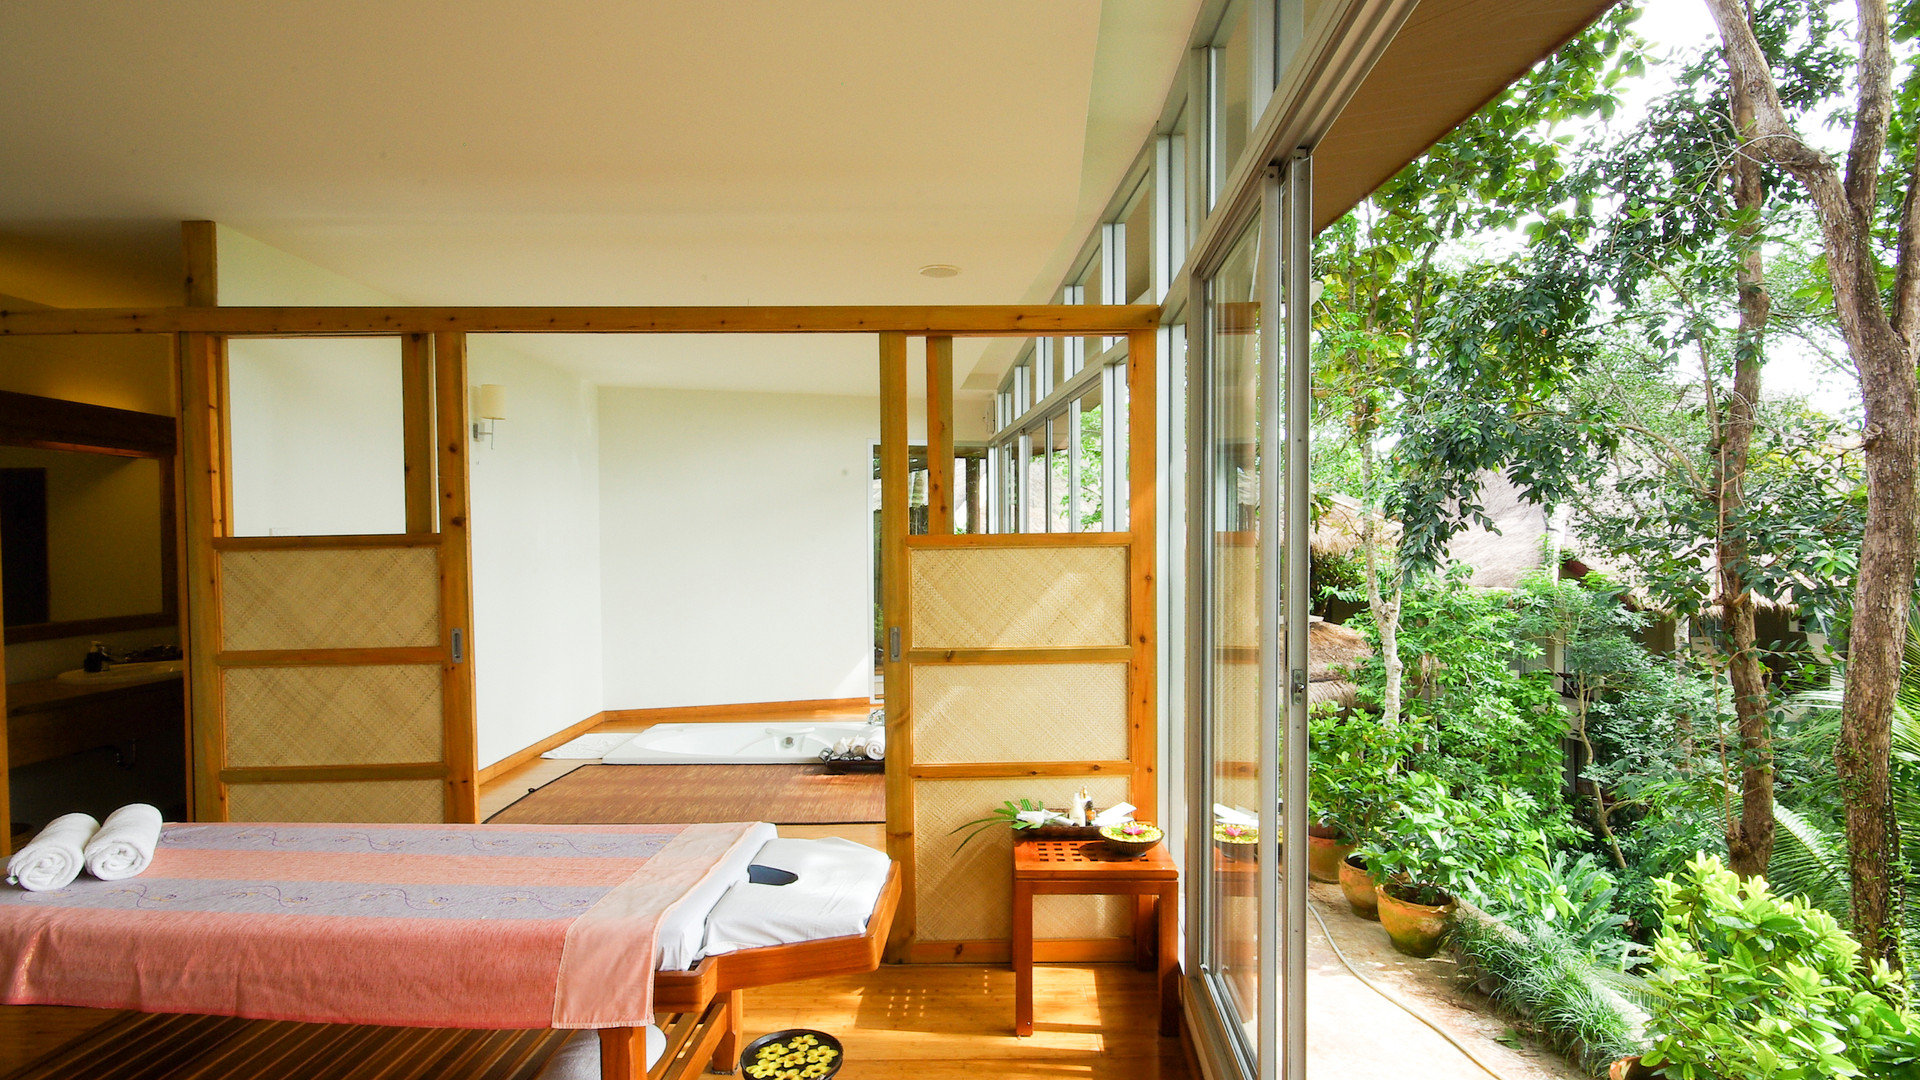 spa-open-nature-room_BwDTdyO2Me.jpg